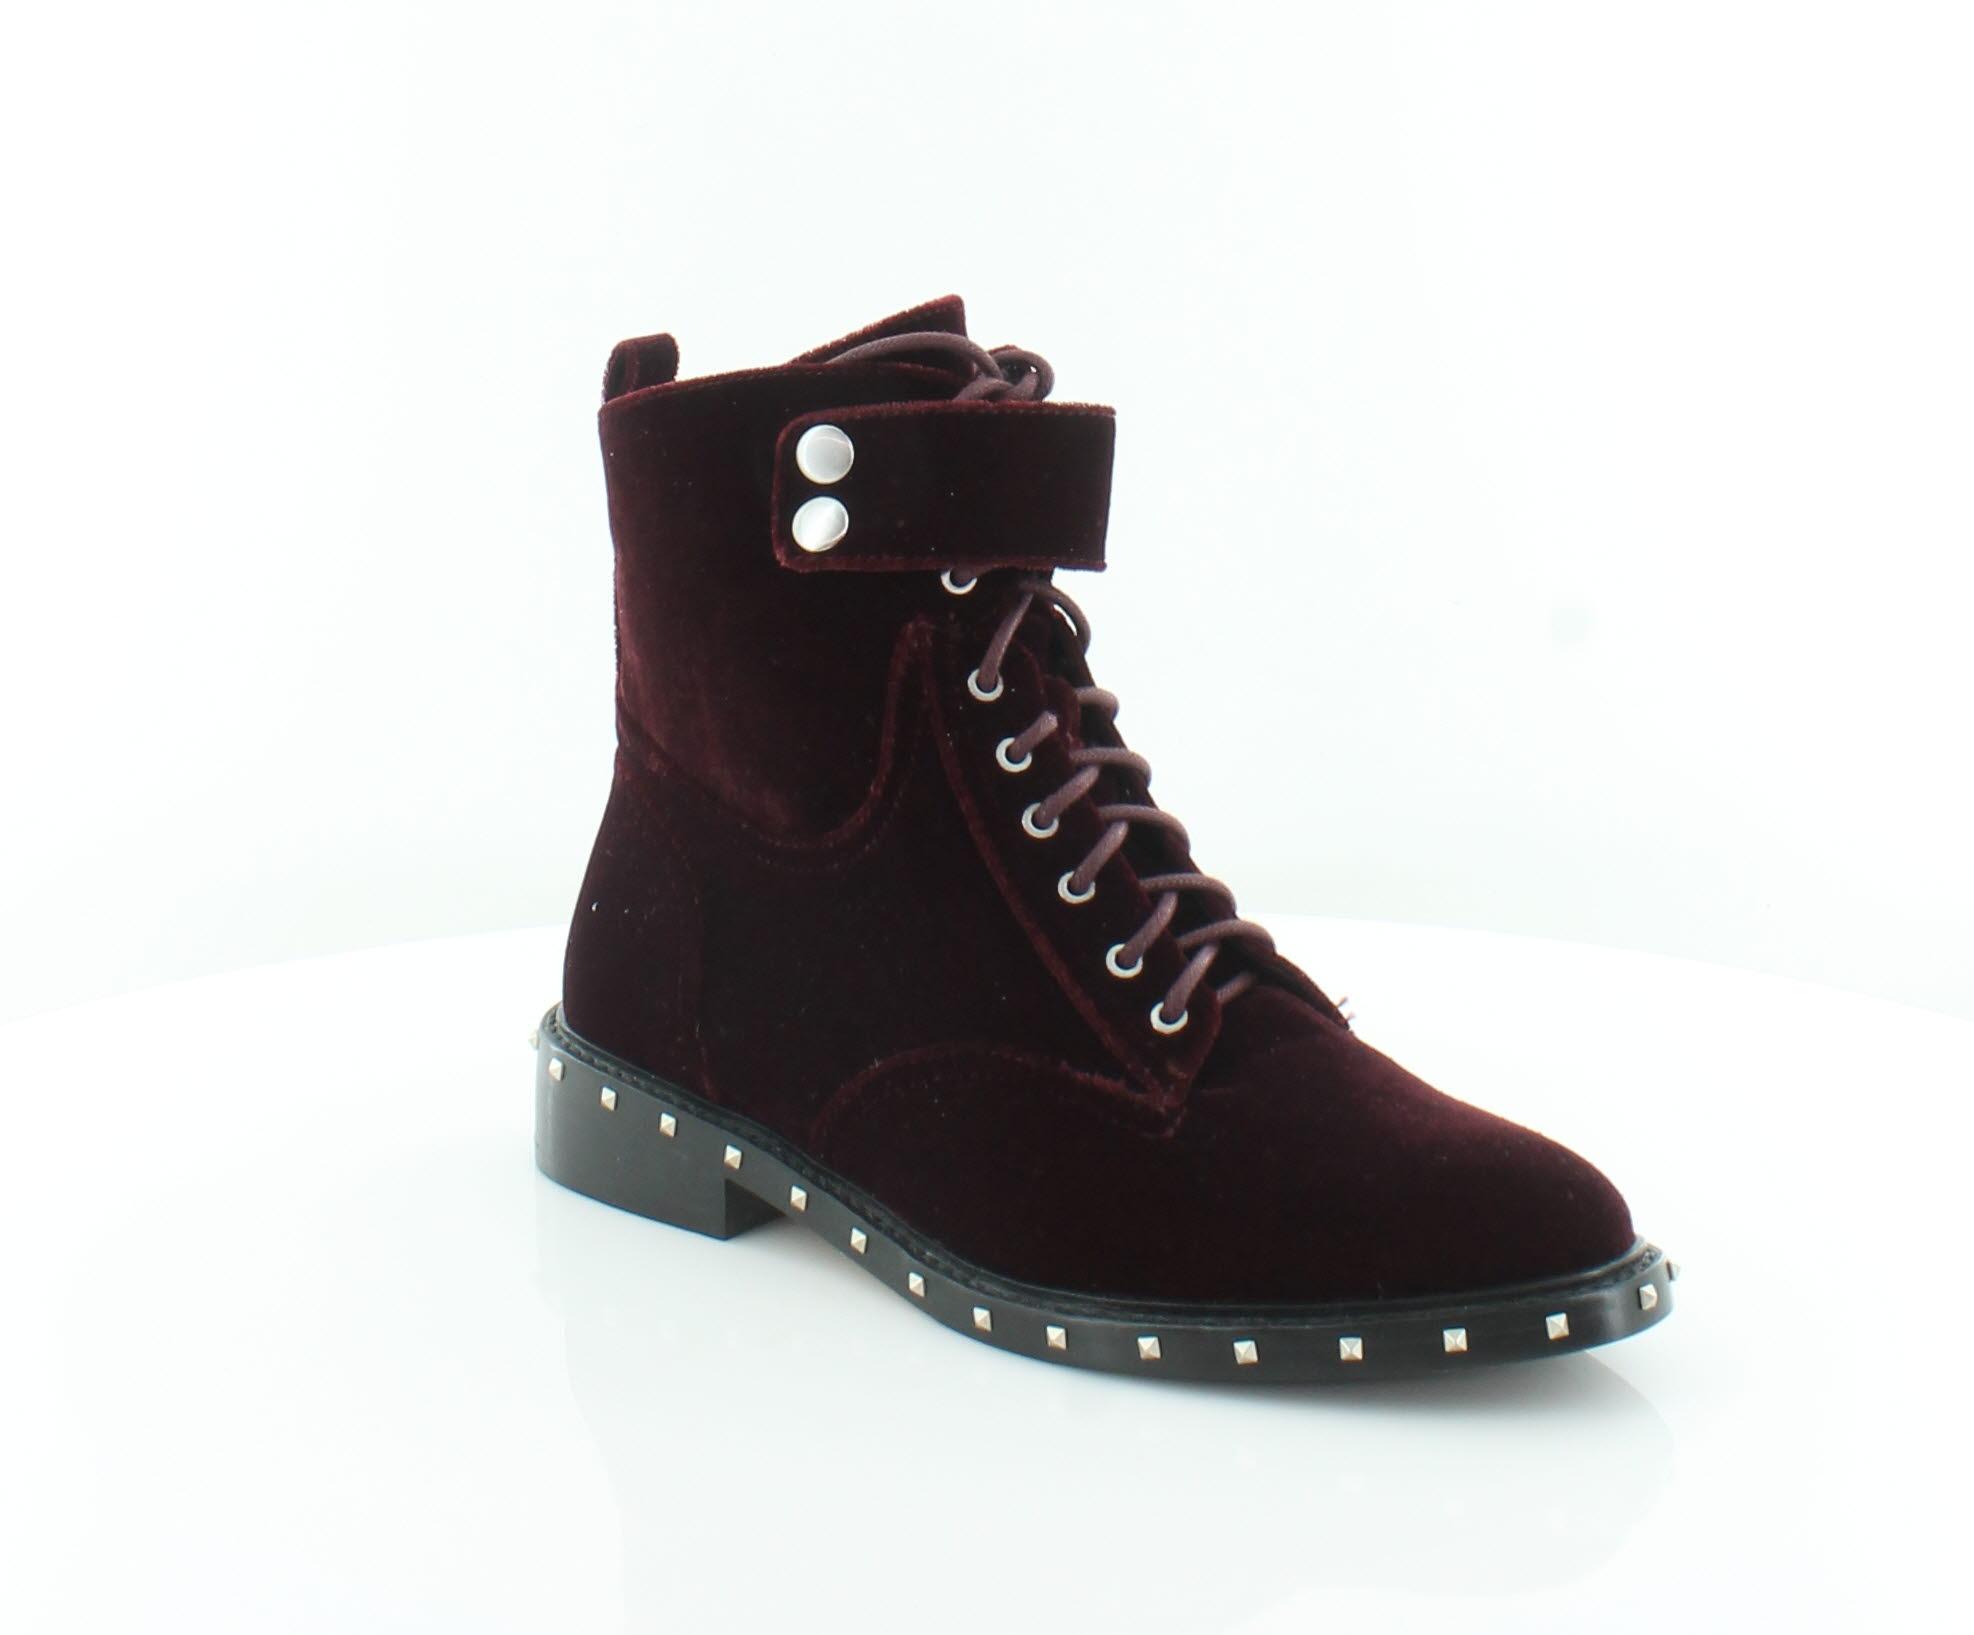 Vince Camuto New Talorini Purple M Donna Shoes Size 8.5 M Purple Stivali MSRP  179 9e6ce0